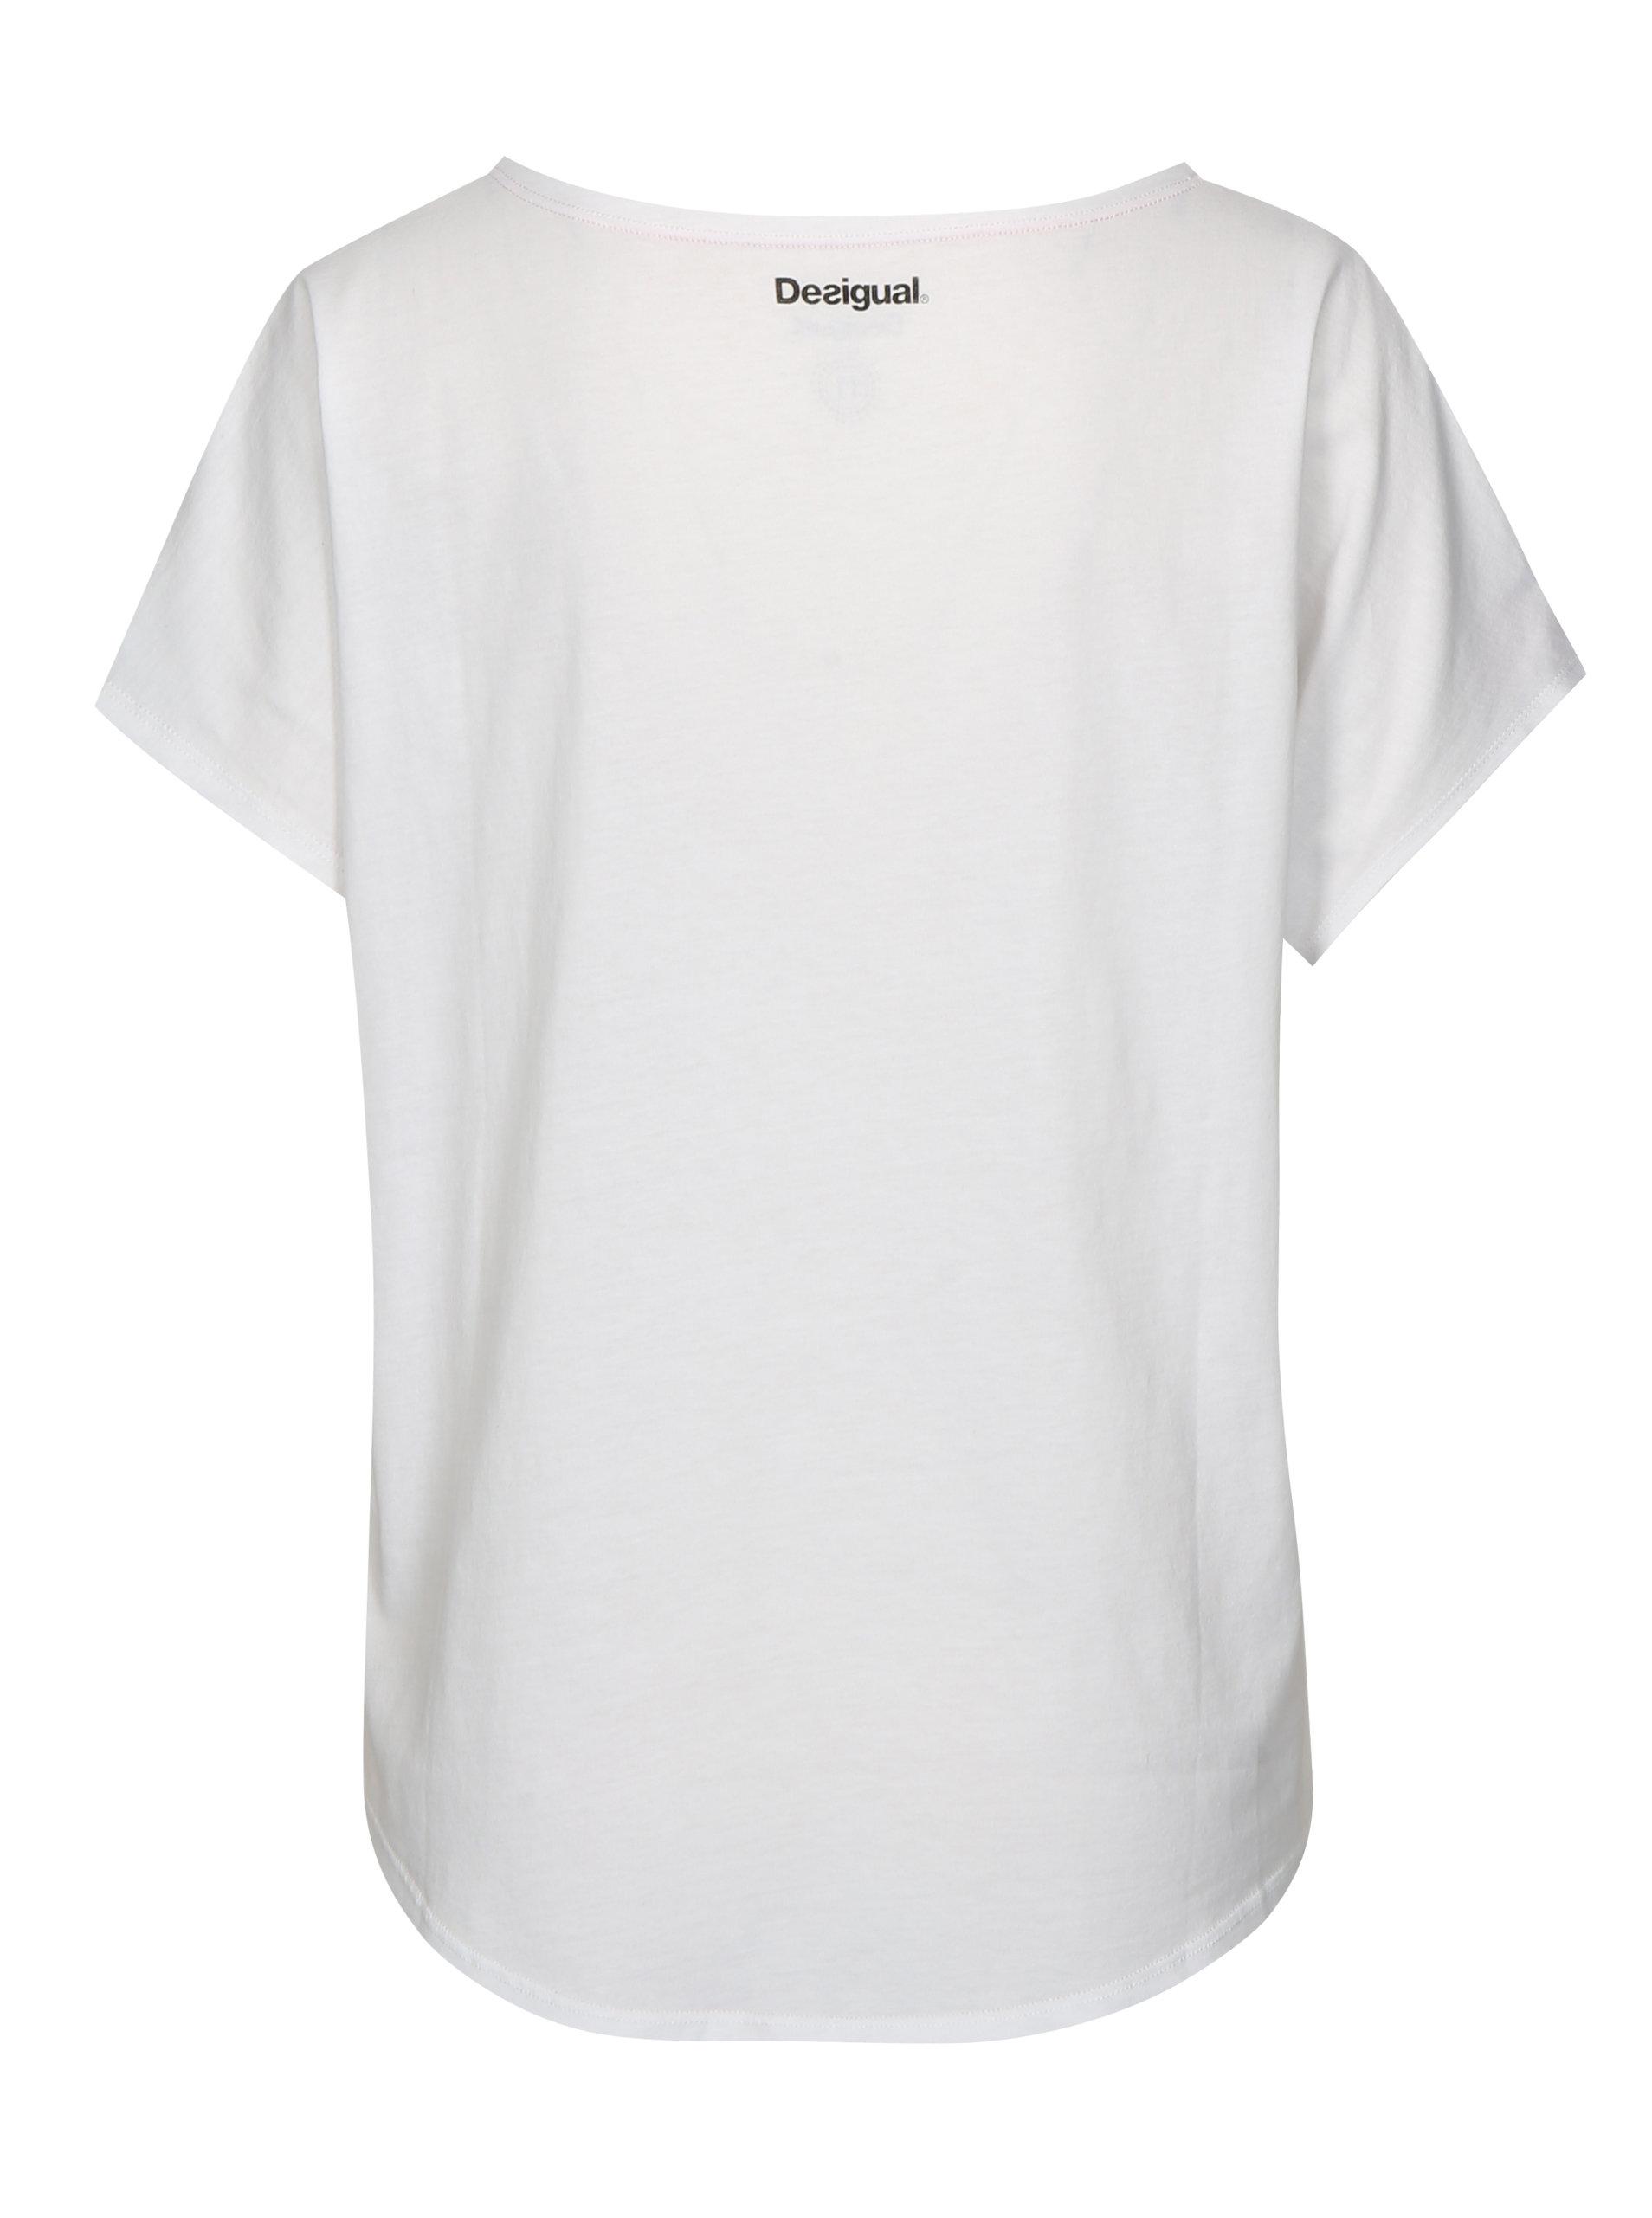 36cfb00b26 Biele tričko s kvetinovým vzorom Desigual Sport ...